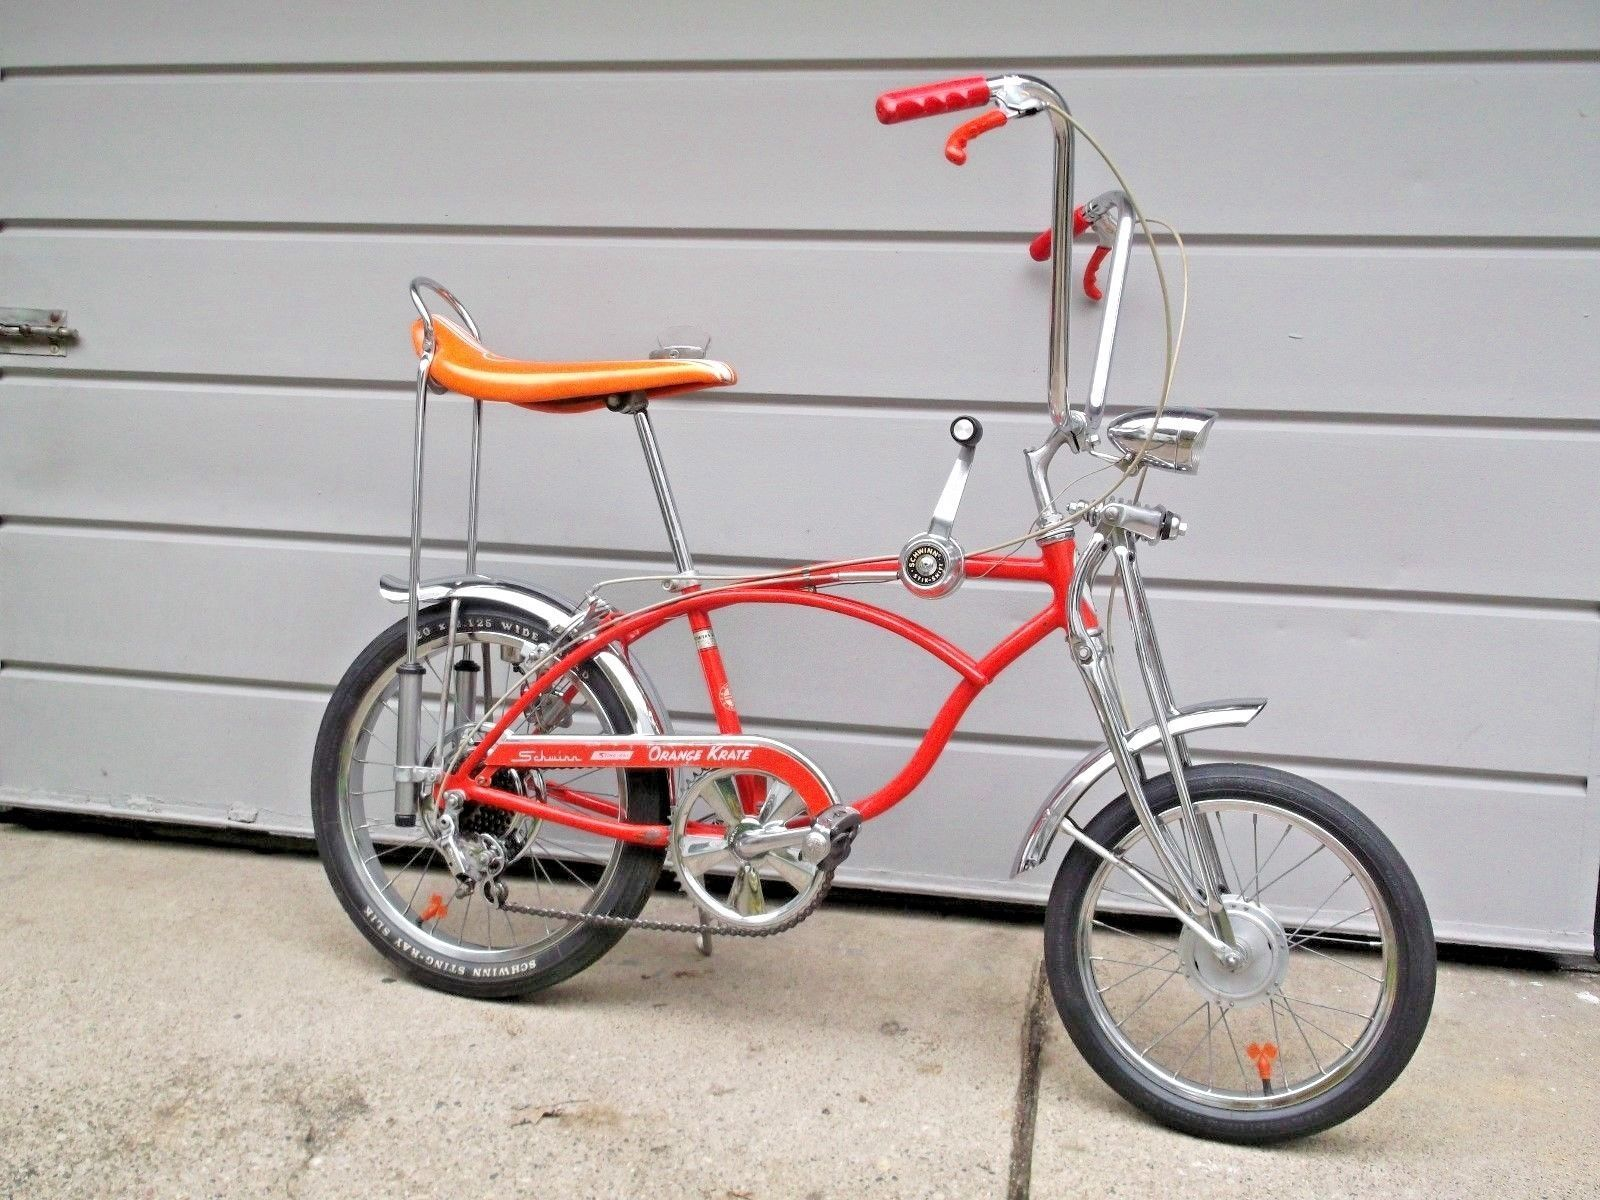 ab75c46381c Details about 1968 Schwinn Sting-Ray Orange Krate bicycle, vintage ...